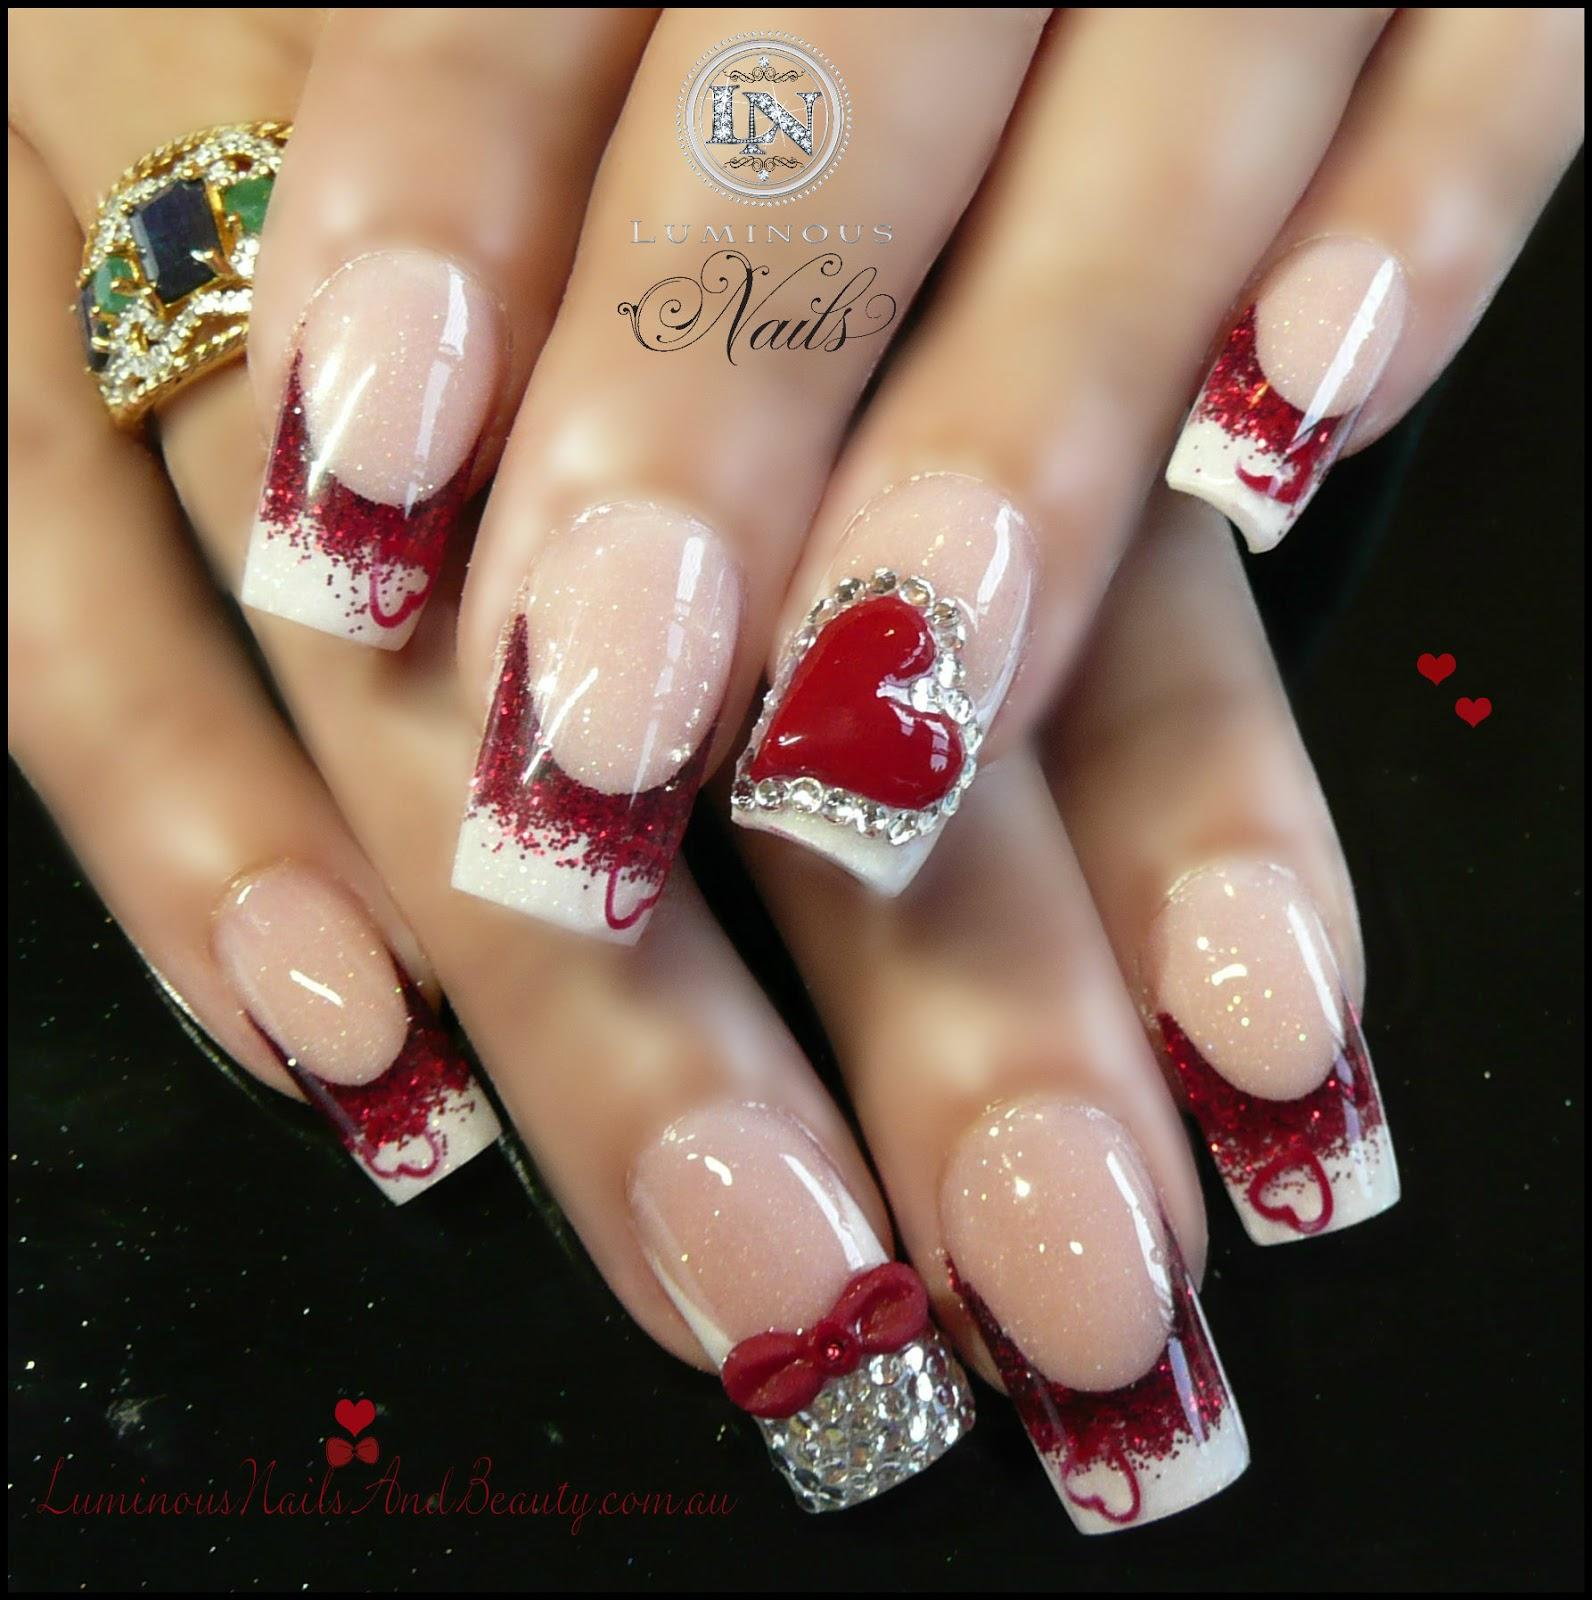 Valentine Nails Valentine's Fingers Luminous+Nails+and+B